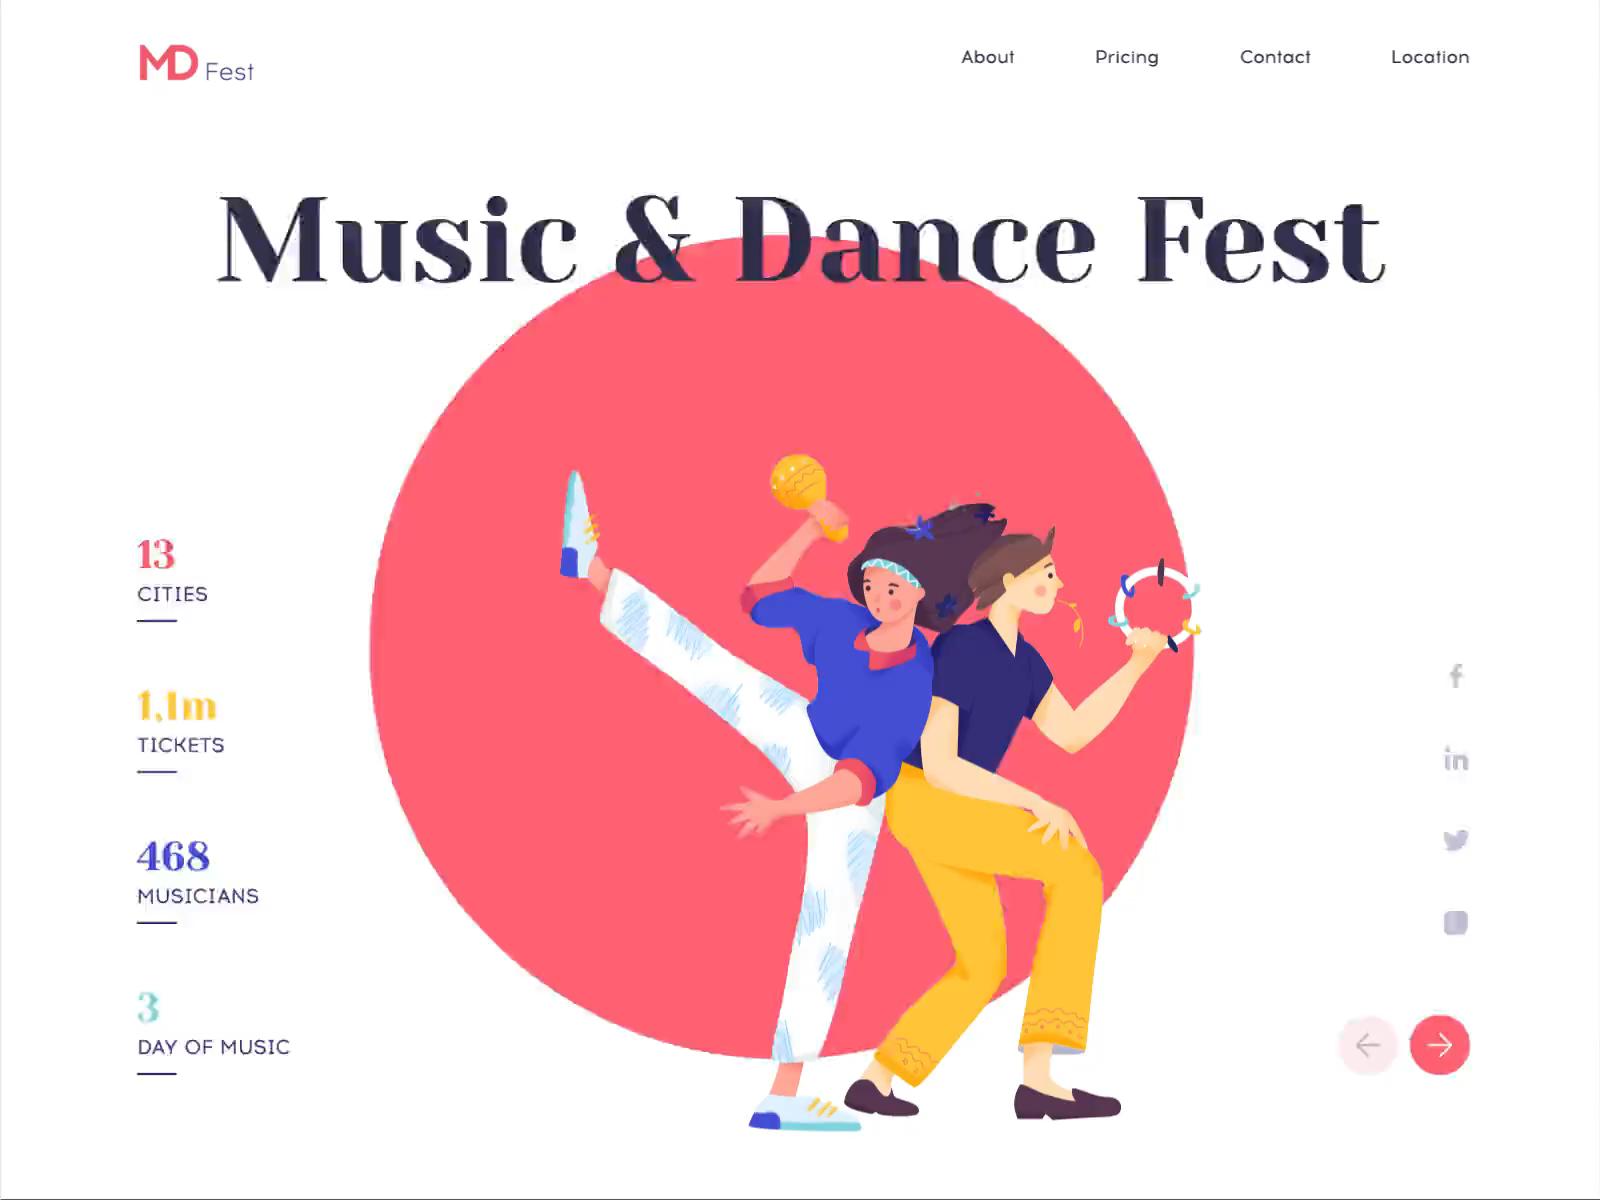 Landing page - MDFest